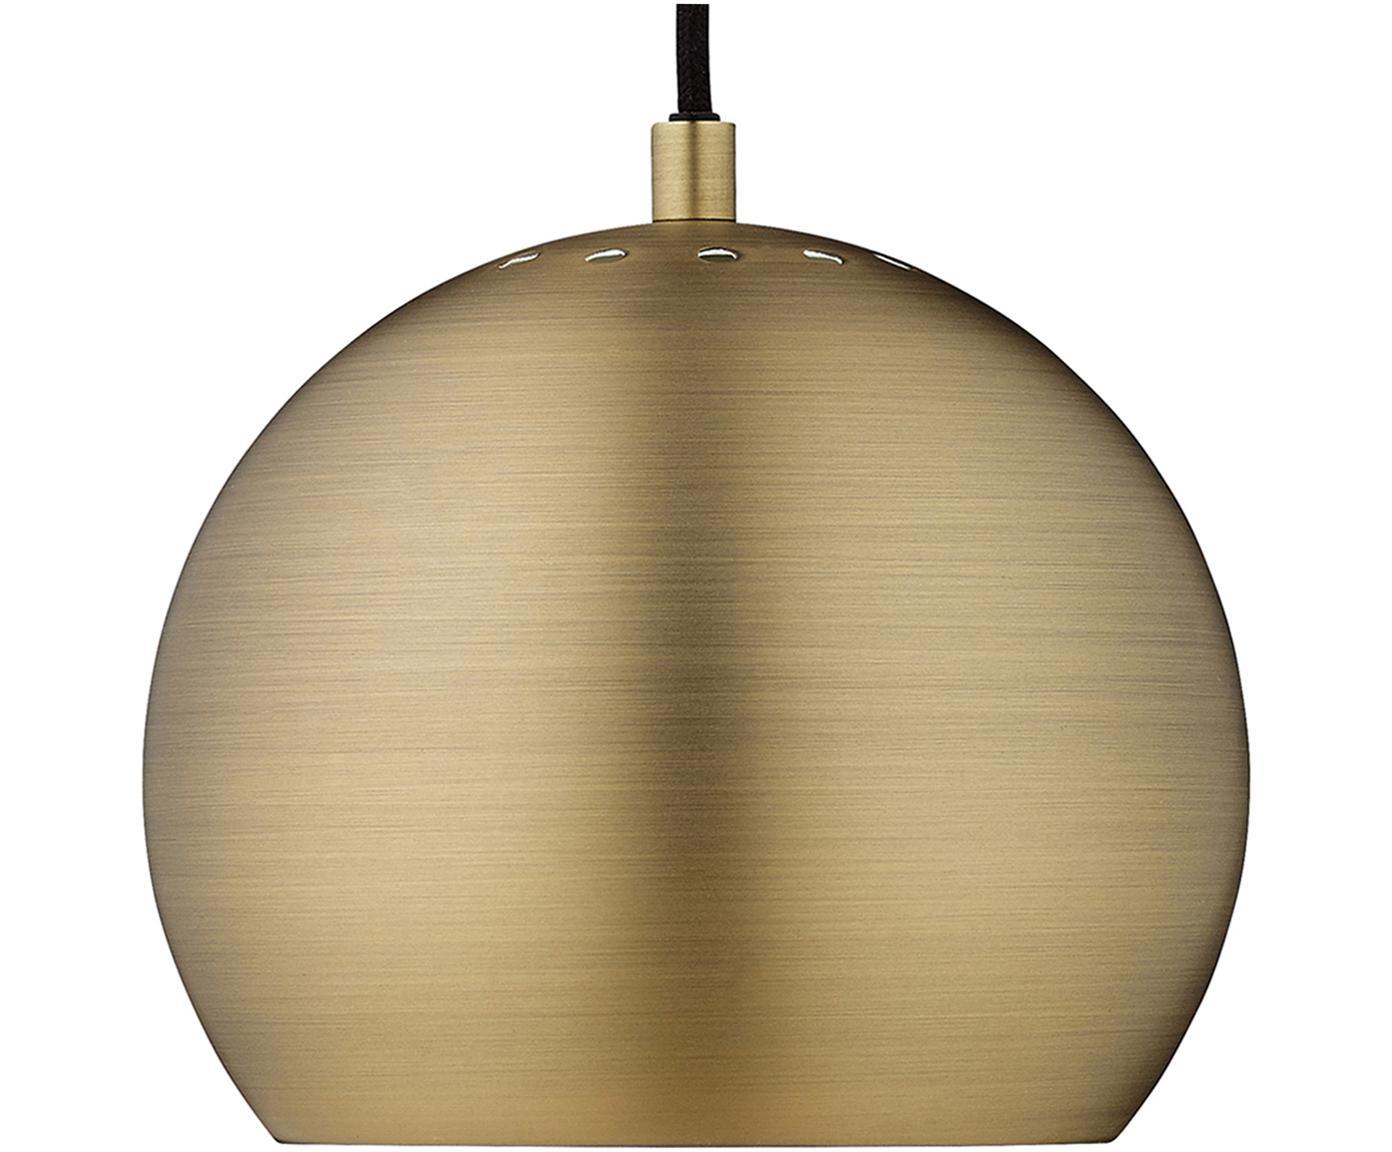 Bolvormige hanglamp  Ball, Lampenkap: geborsteld messing, Messingkleurig, zwart, Ø 18 cm